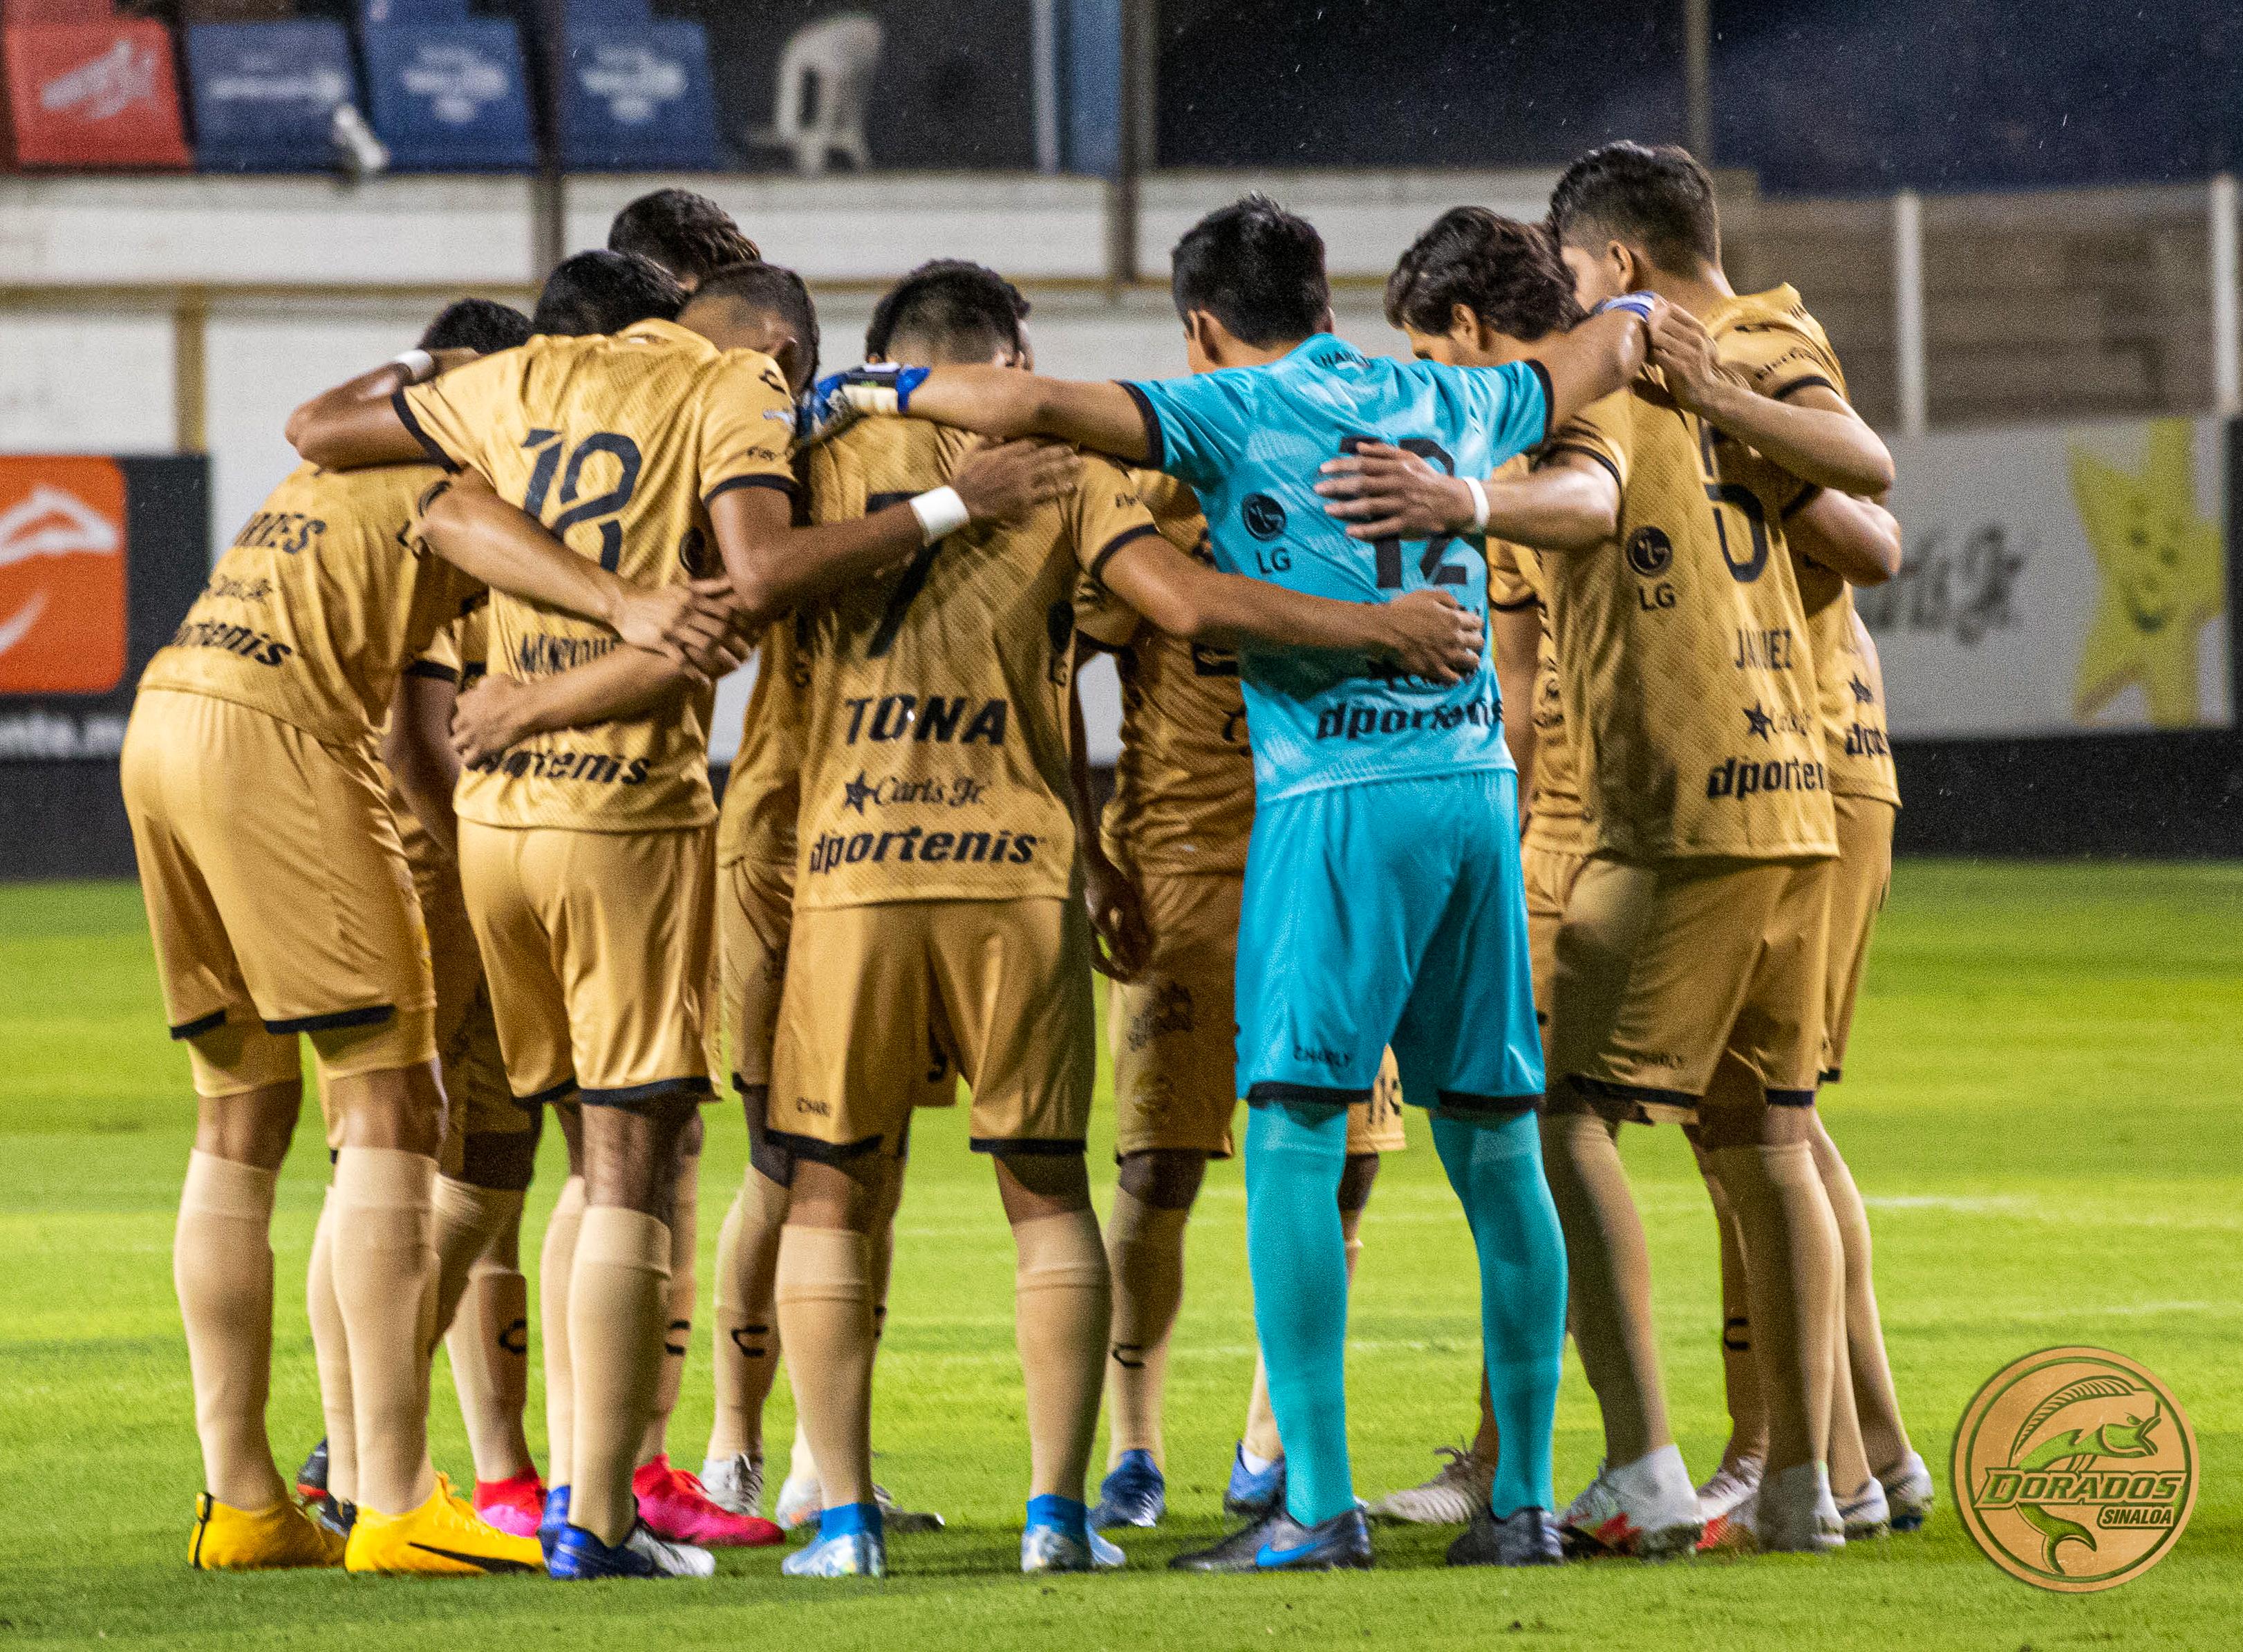 J1 | Dorados vs Celaya